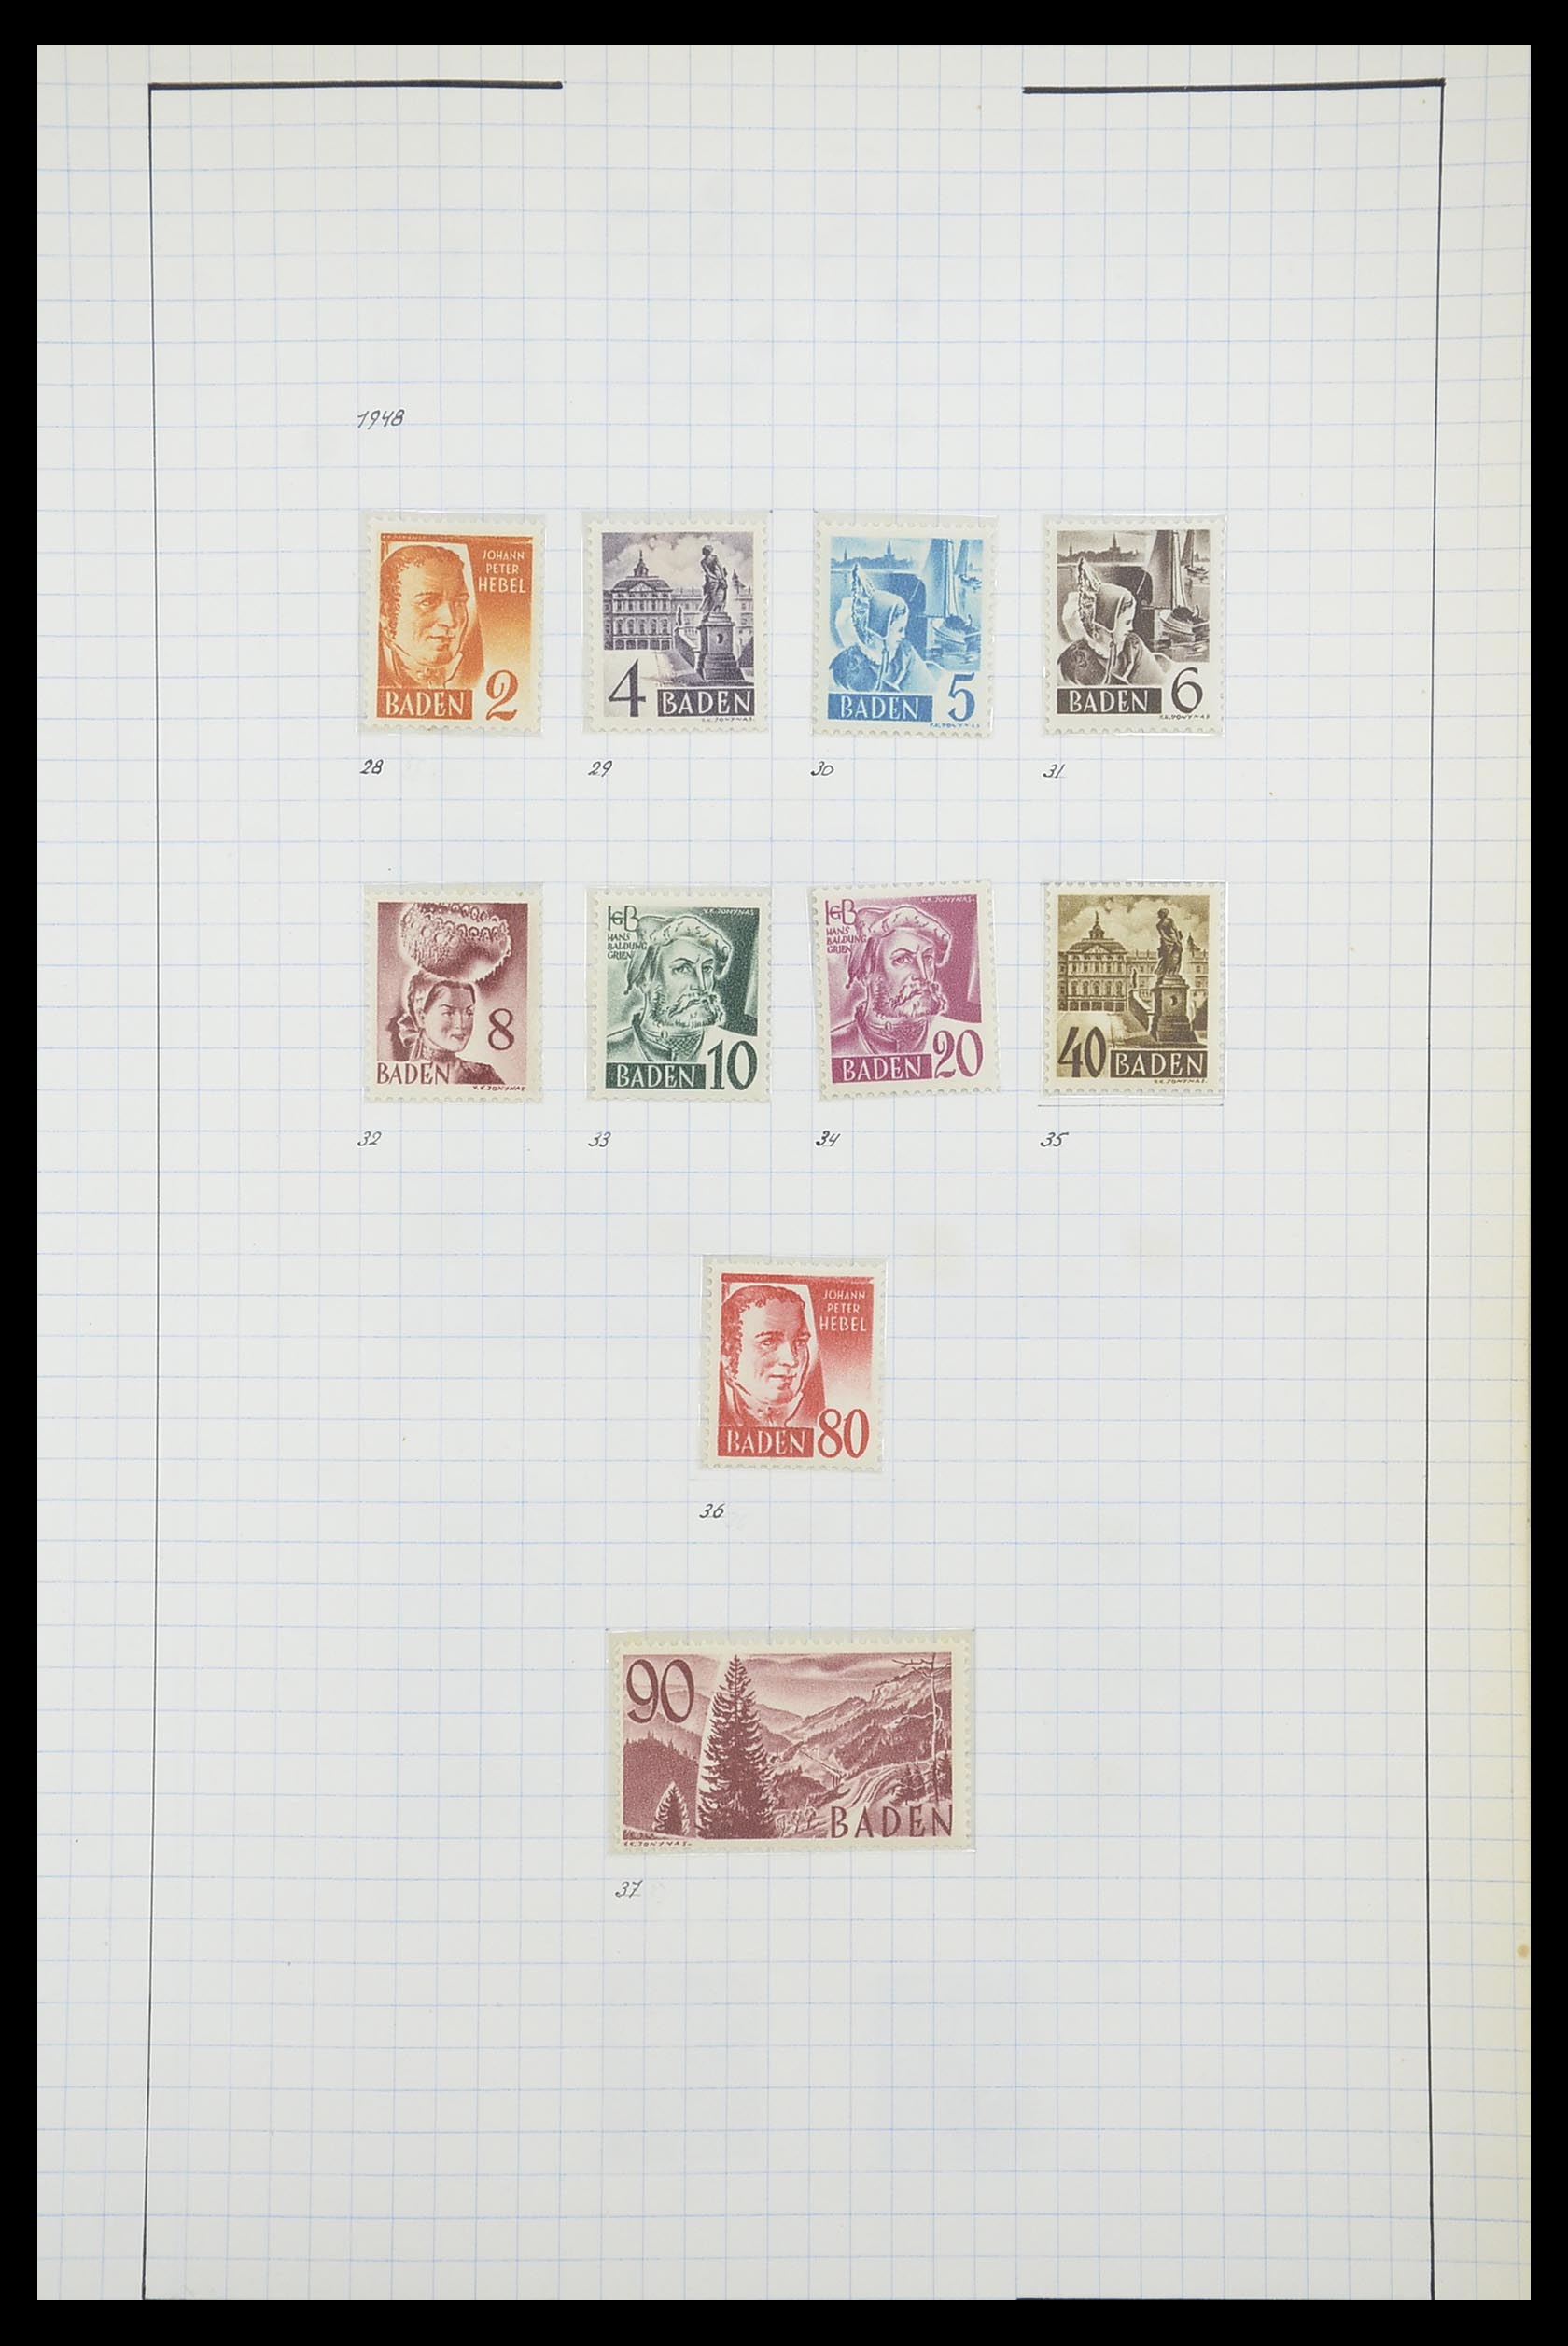 33864 009 - Postzegelverzameling 33864 Franse Zone 1945-1949.